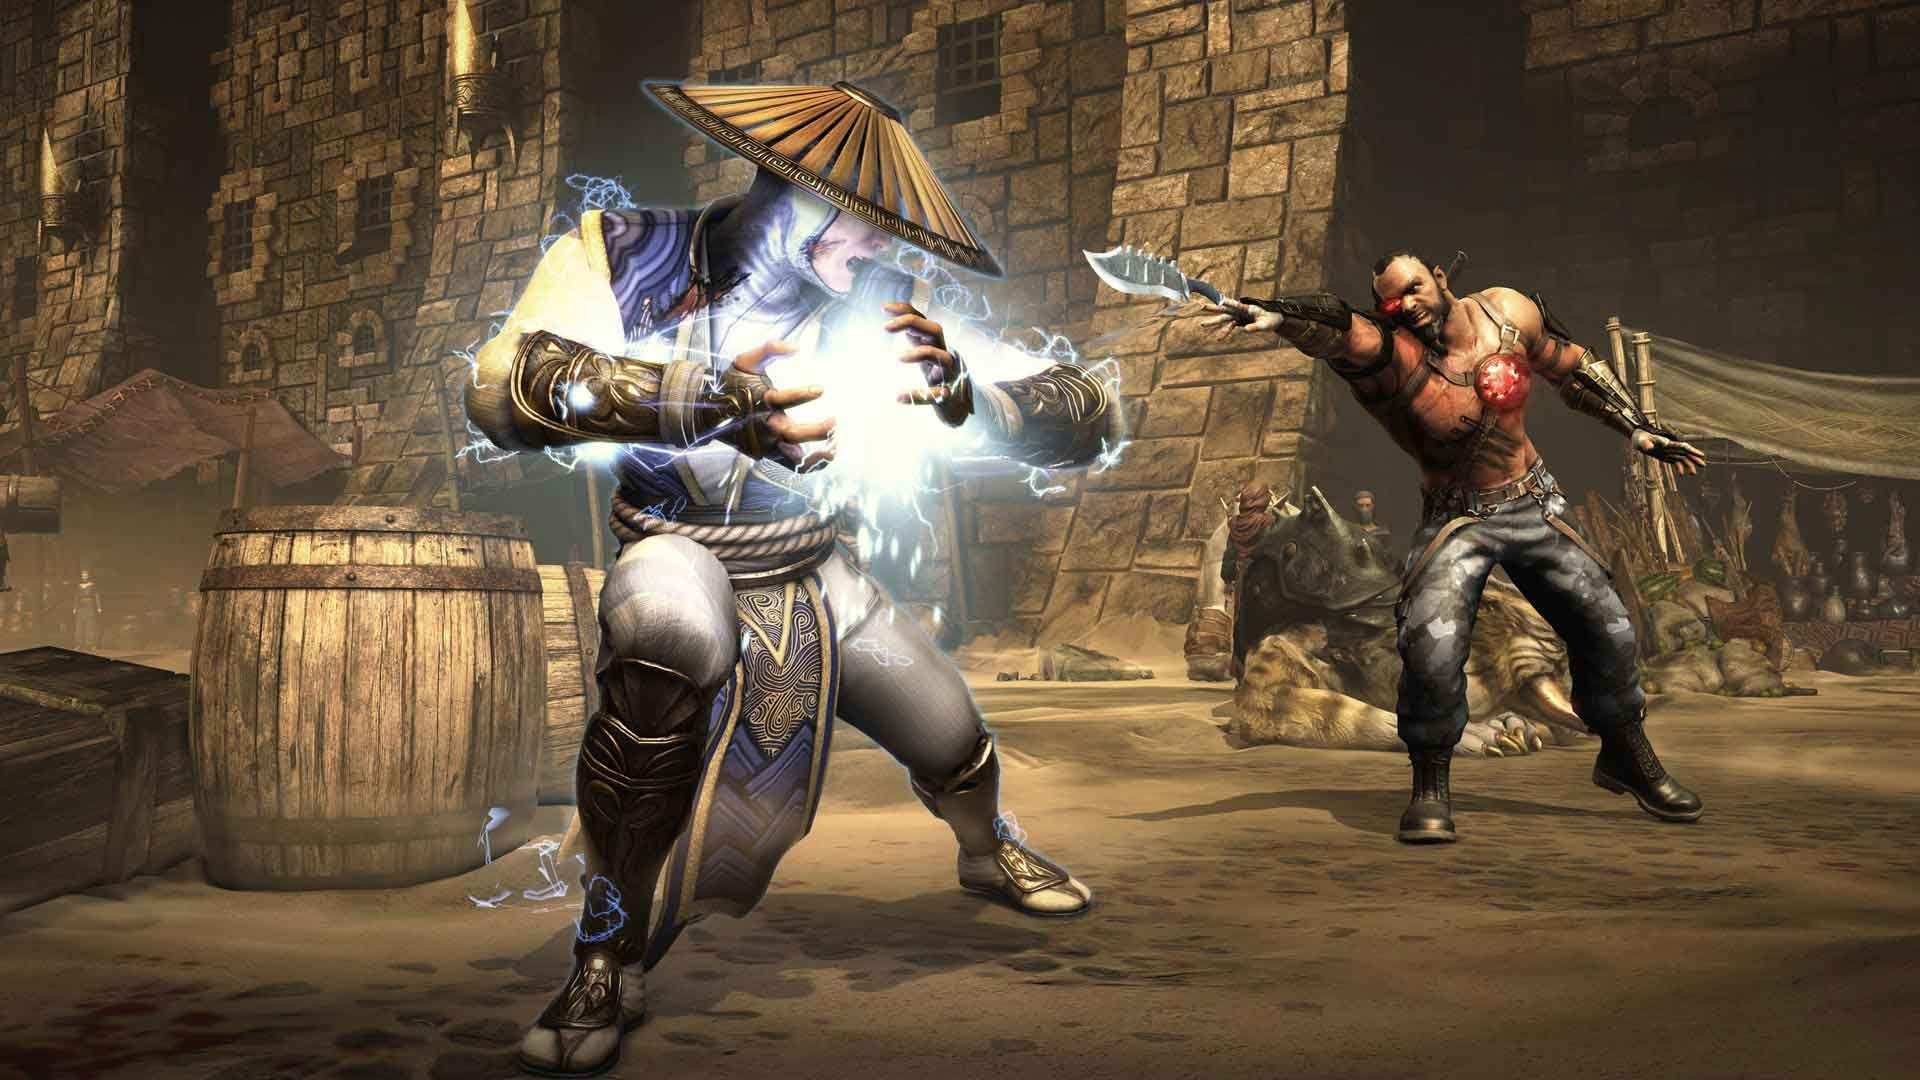 yazi_81205_3 Mortal Kombat X - İnceleme